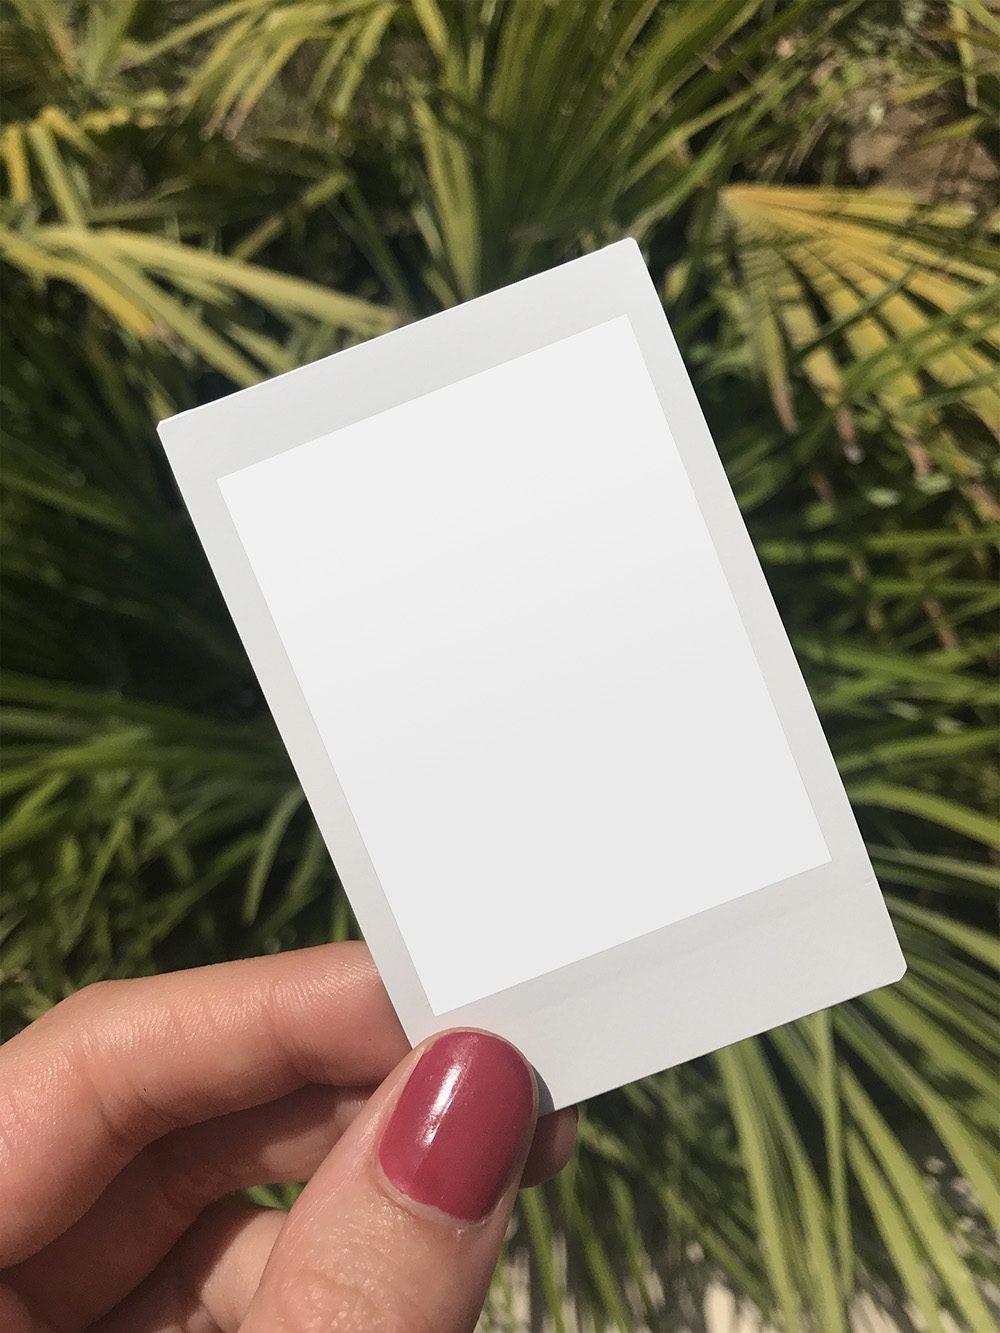 12-hand-holding-polaroid-frame-mockup